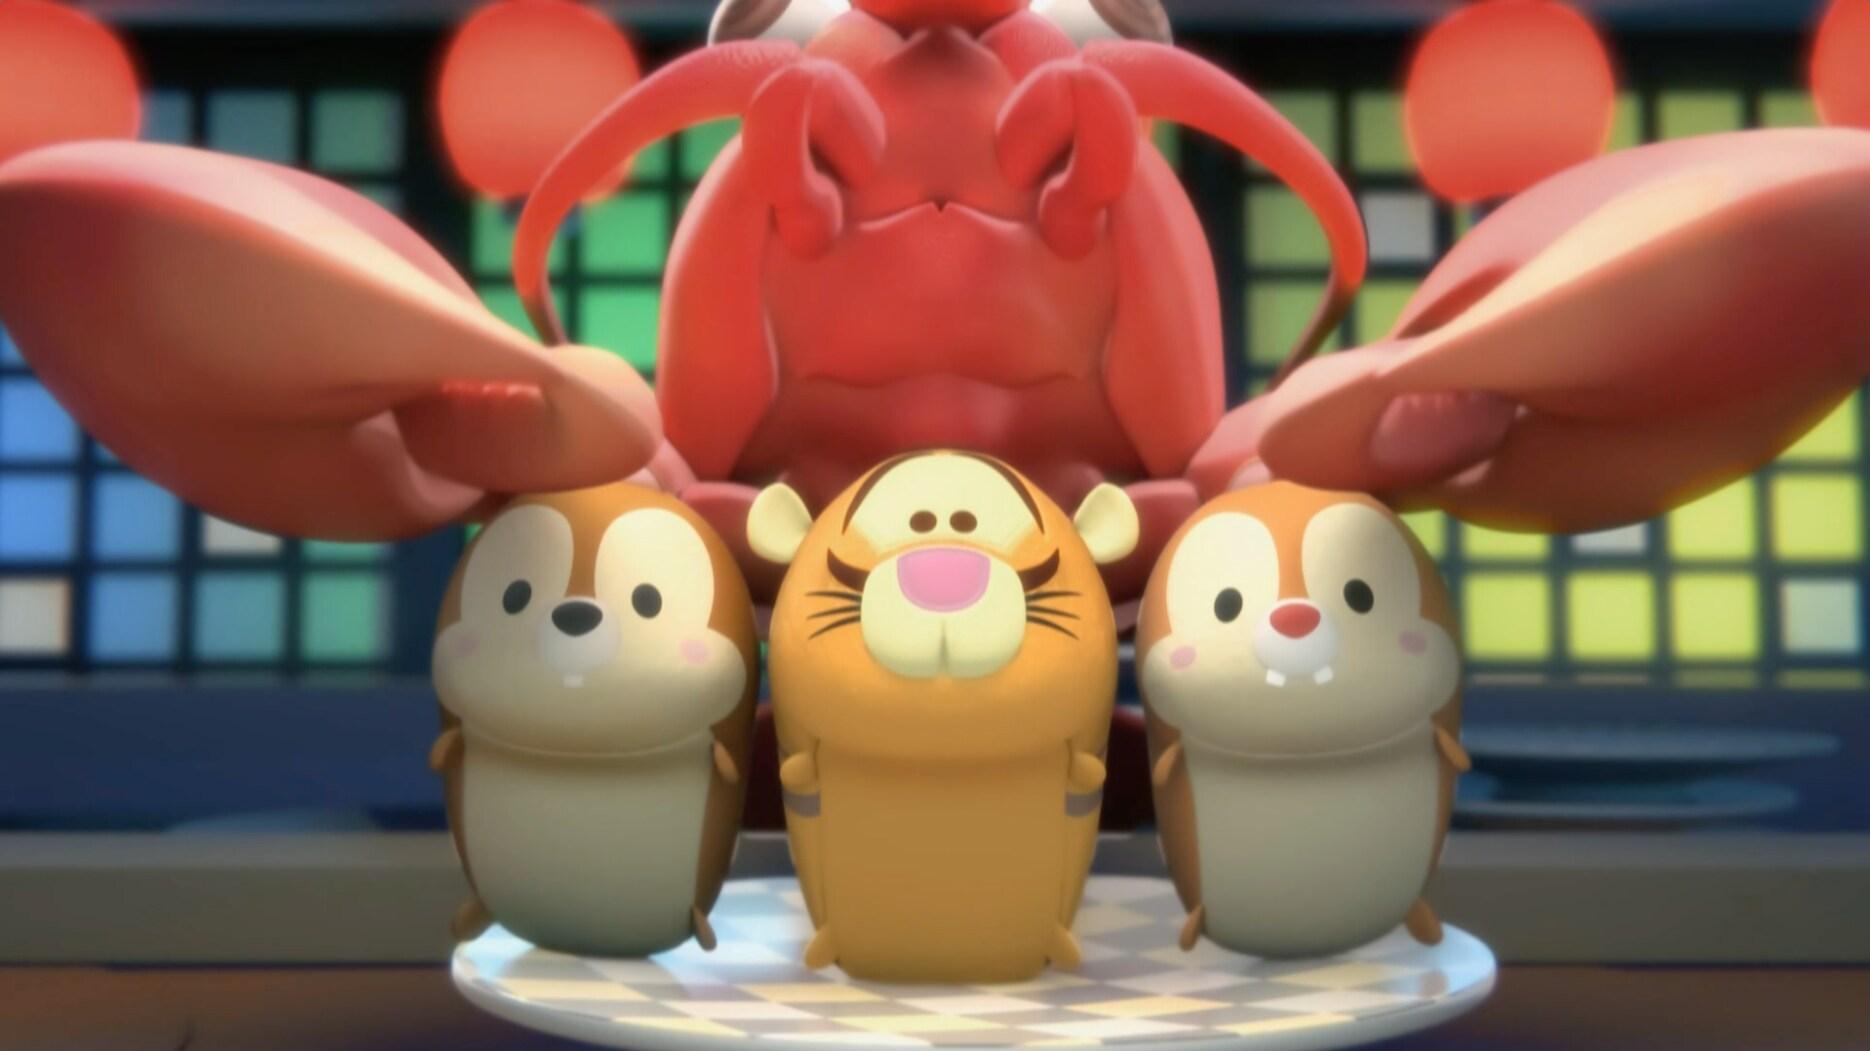 Fiesta de sushi  - Tsum Tsum